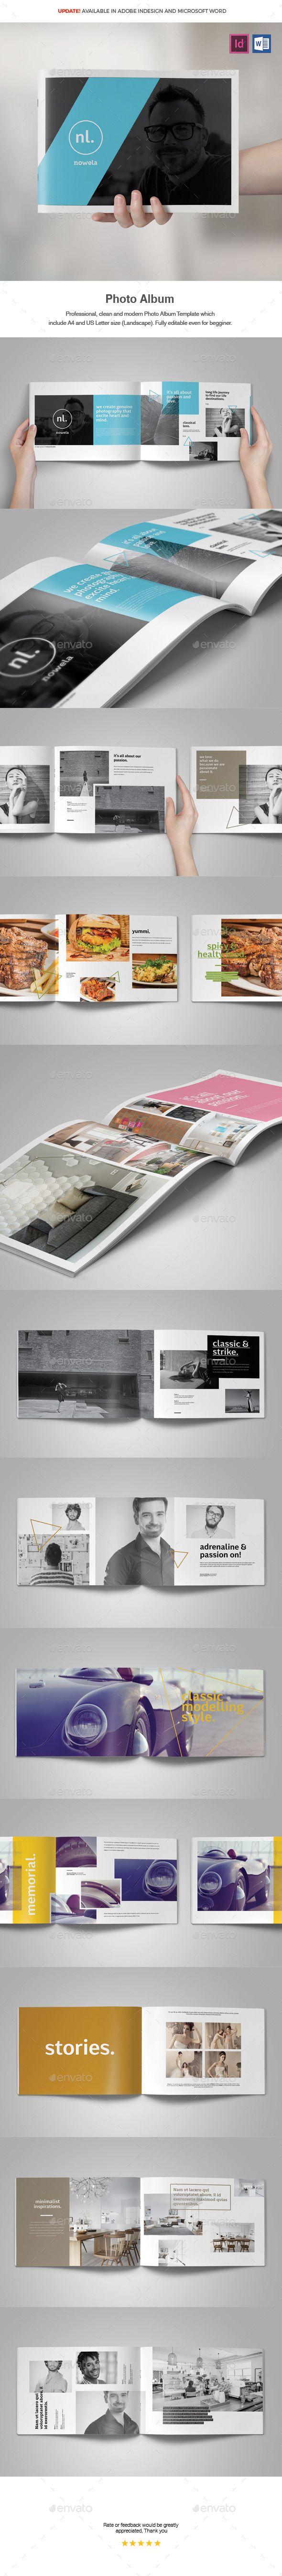 Photo Album Template - Photo Albums Print Templates Download here: https://graphicriver.net/item/photo-album-template/18240535?s_https://graphicriver.net/item/sleek-photo-album-portfolio/1970182?ref=classicdesignp